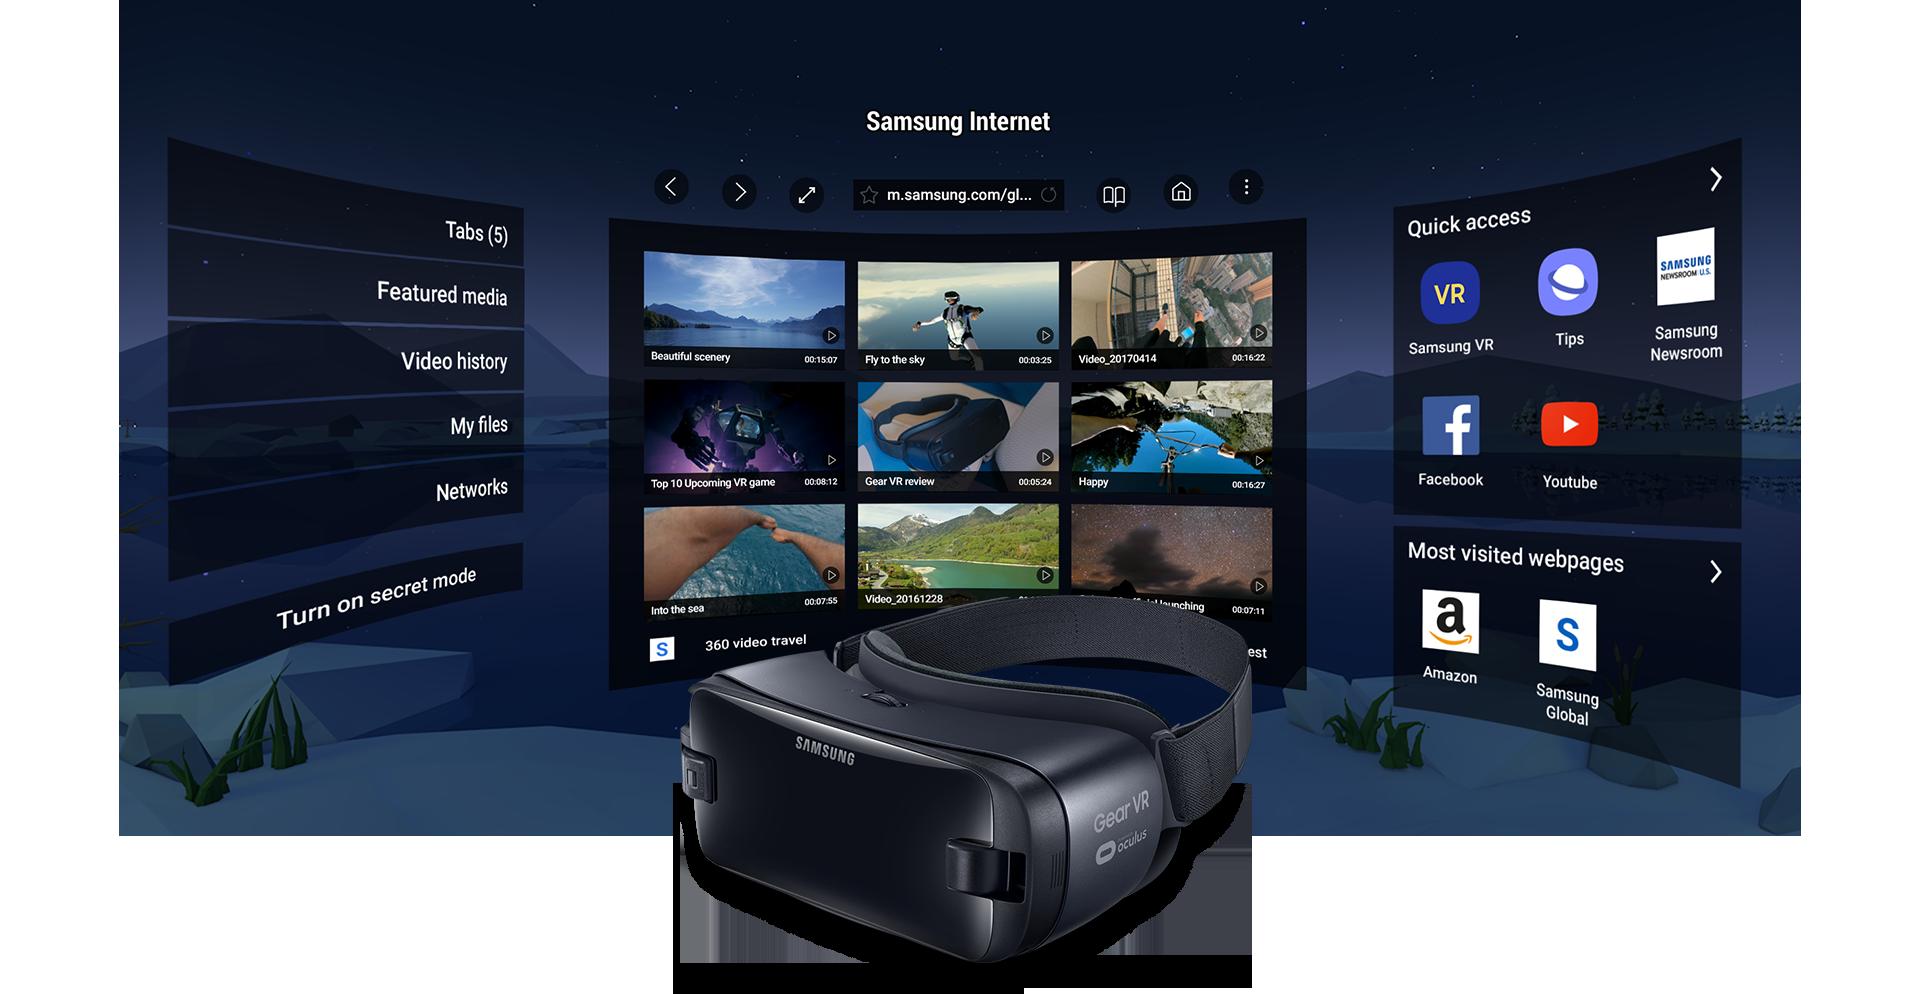 Shop customer account login downloader/downloader - Image Of Gear Vr Black And Image Related Optimized Web Browsing